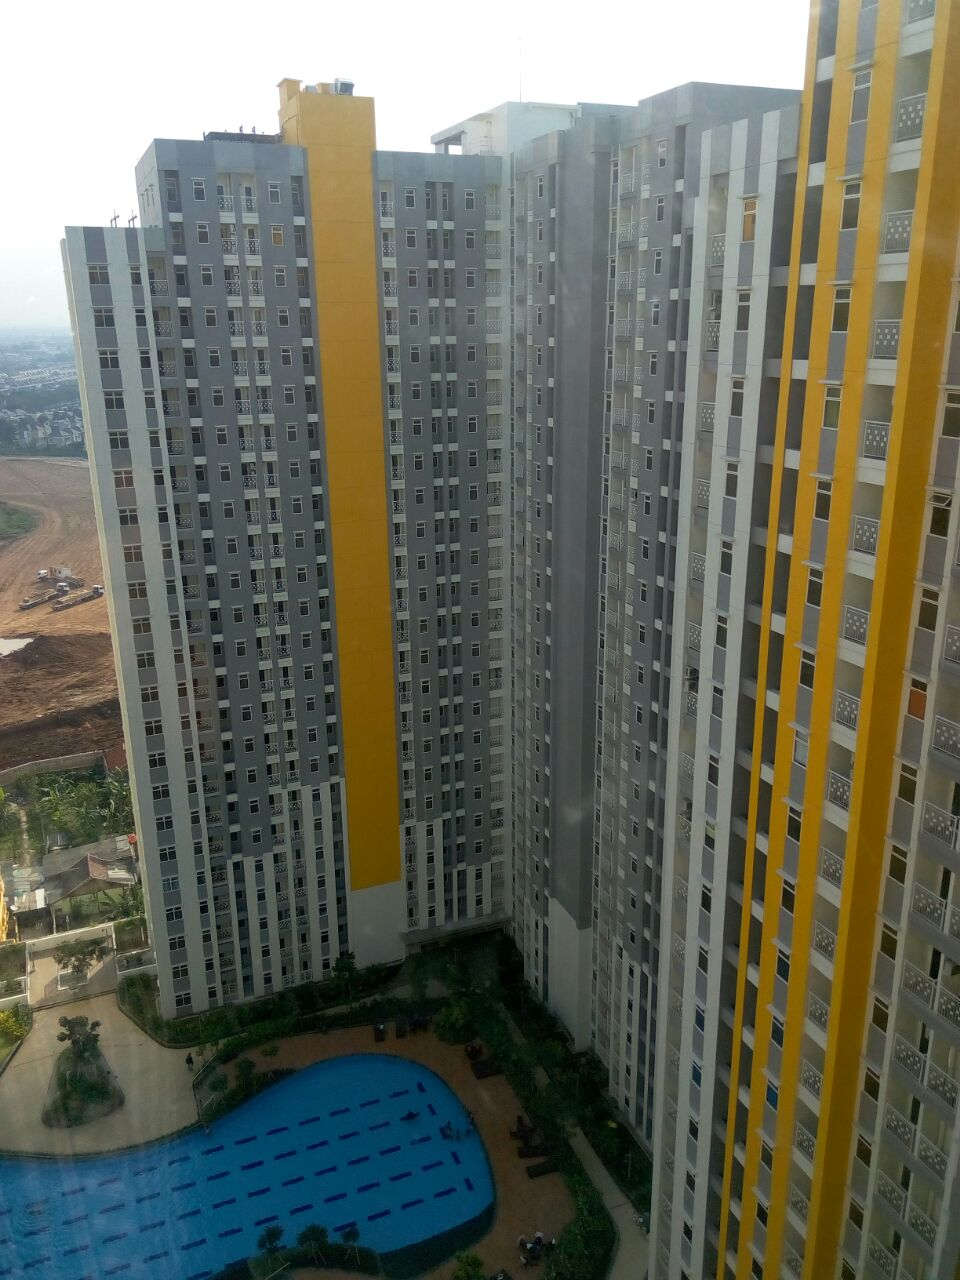 Jual Rugi Apartment Springlake 2 BR Tower Davalia Lt.26 No.28 Cuma 400 Jutaan